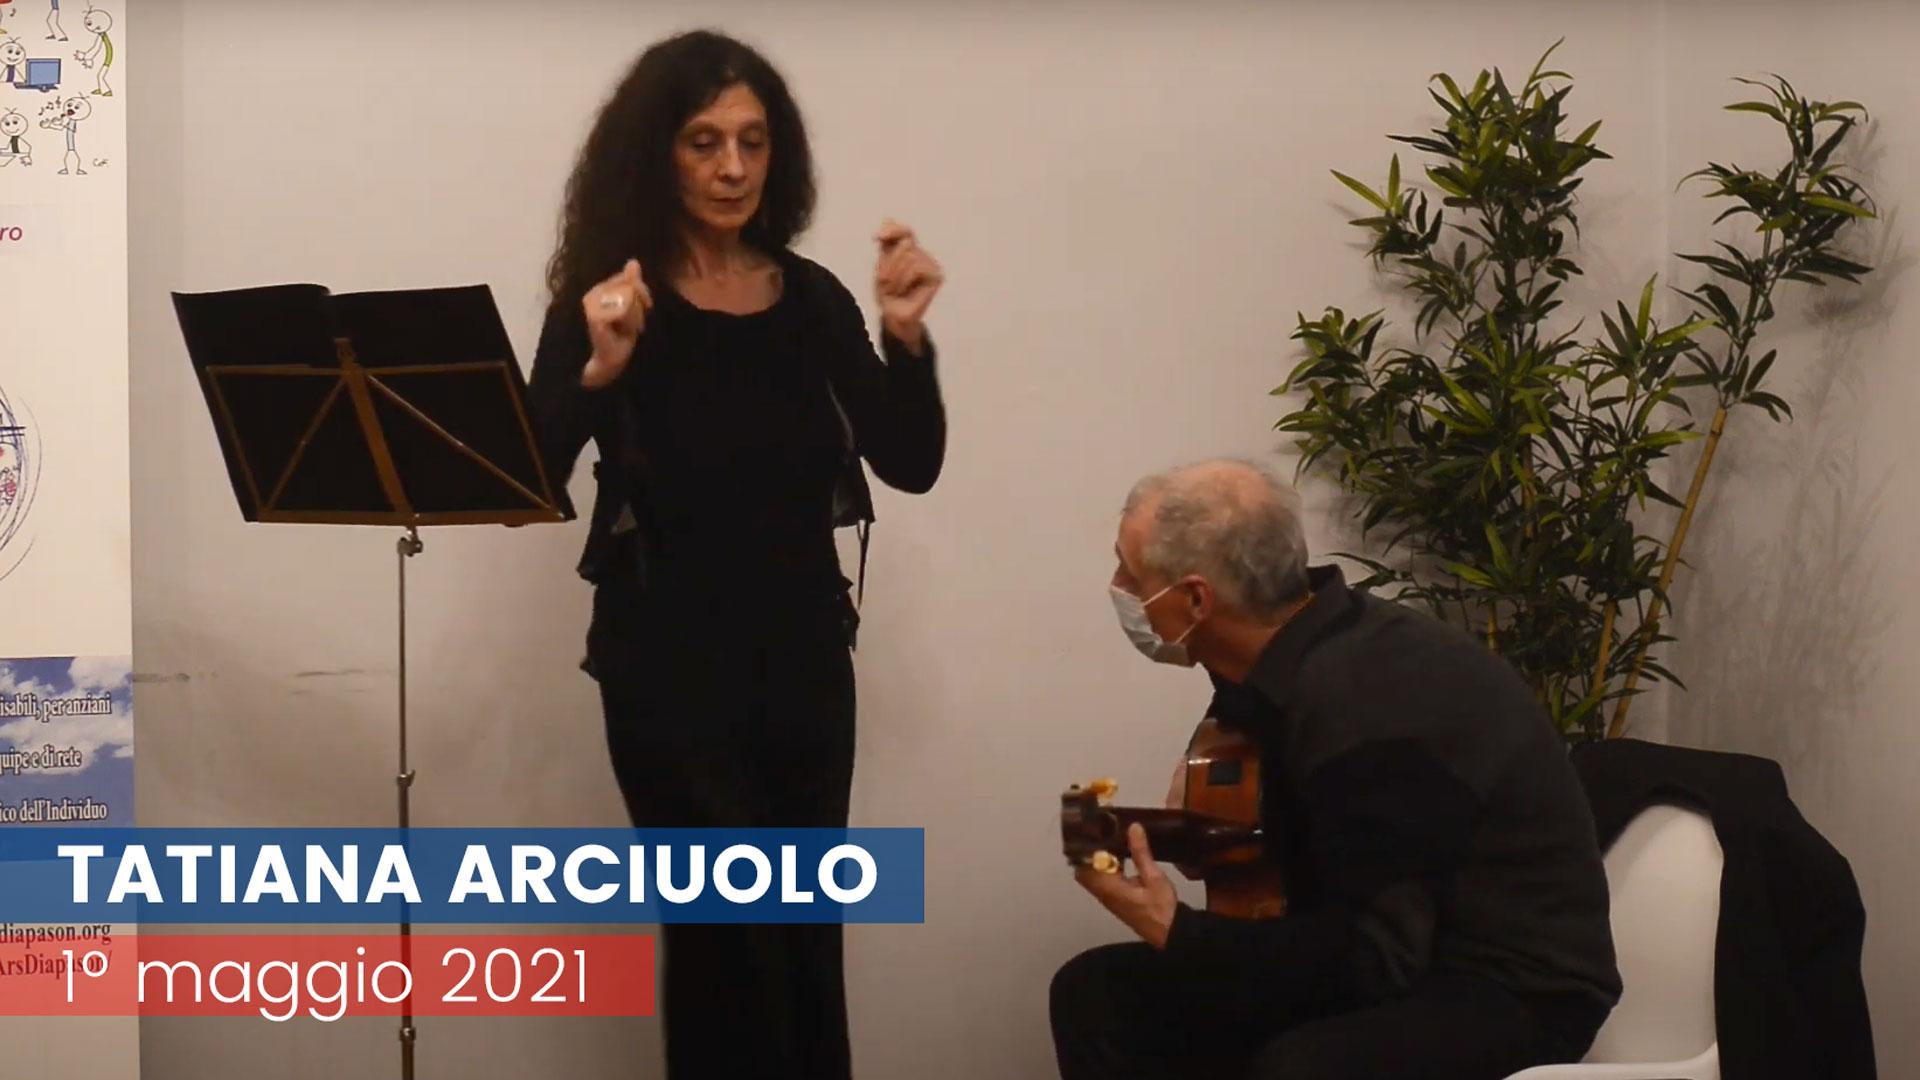 Tatiana Arciuolo – 1° maggio 2021